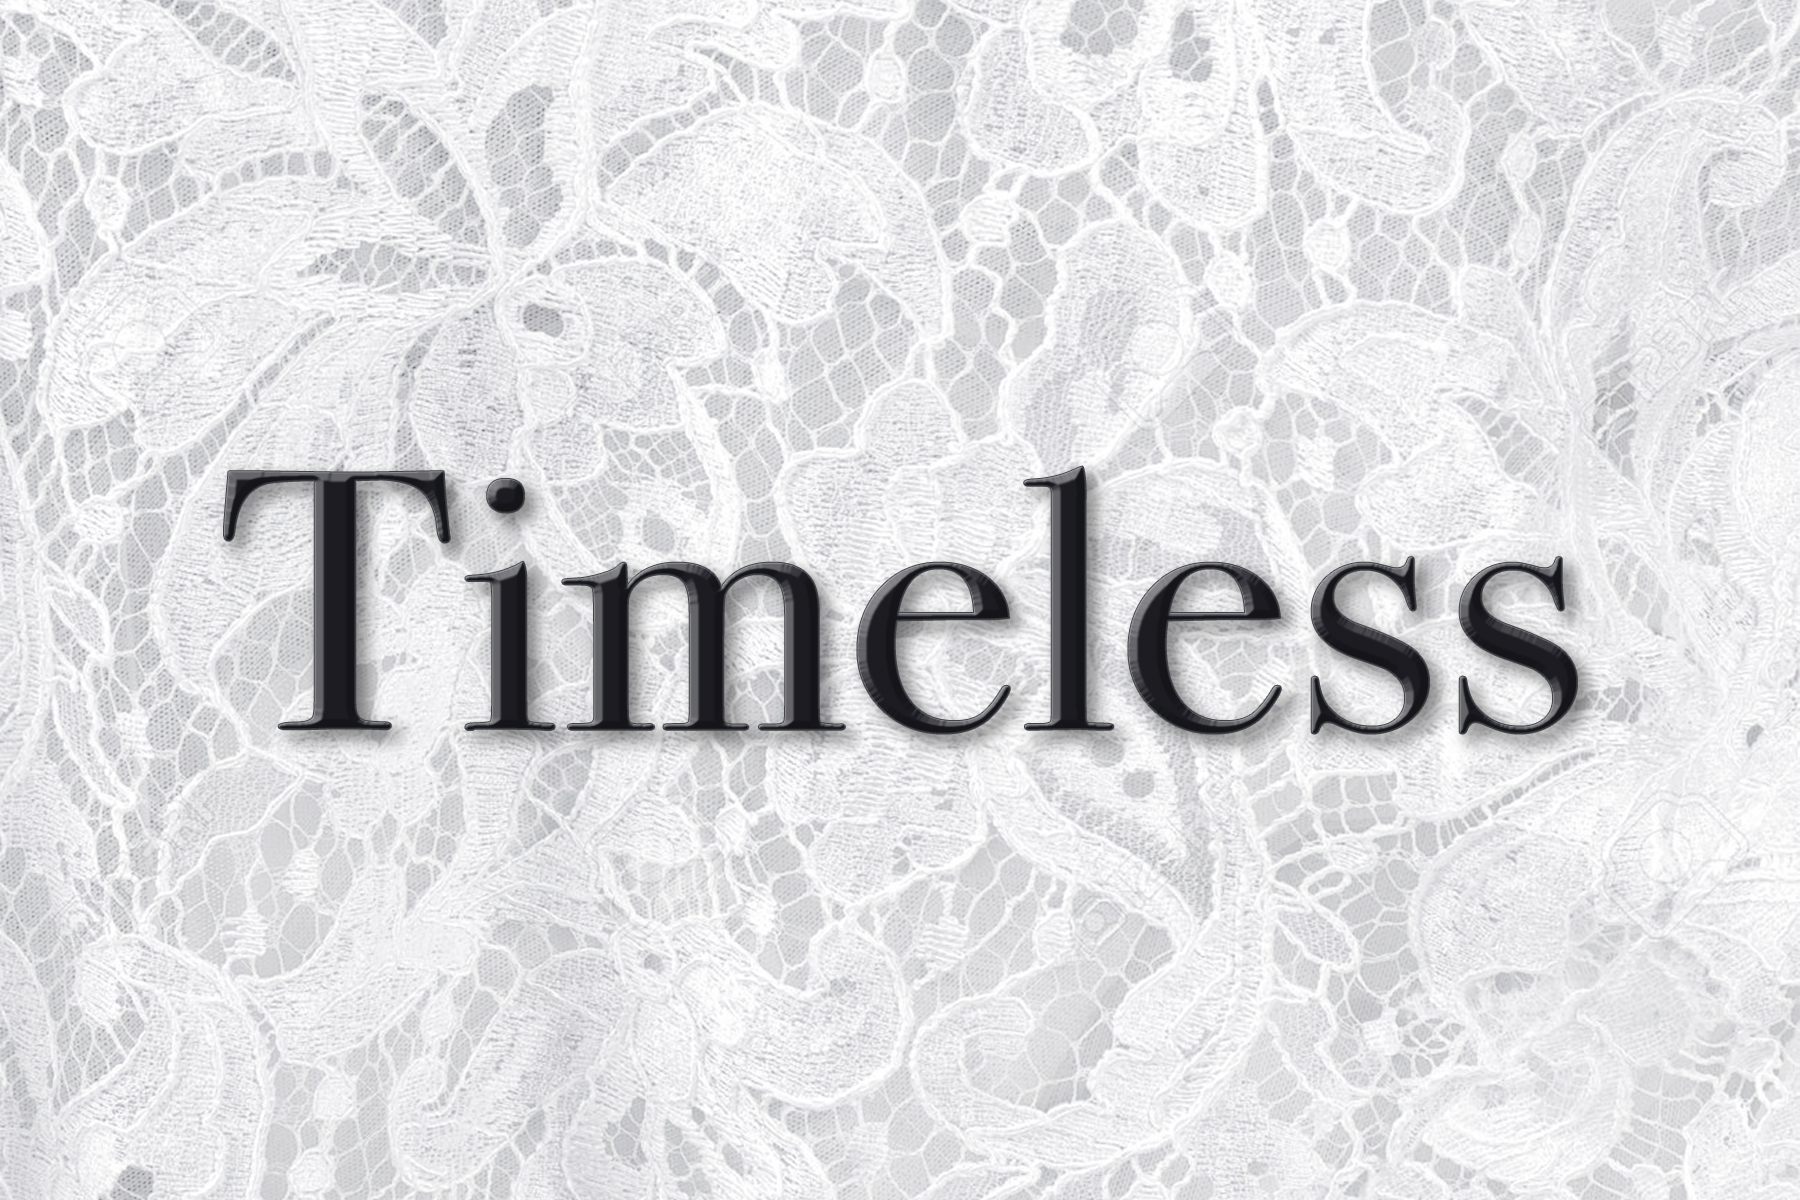 Timeless3